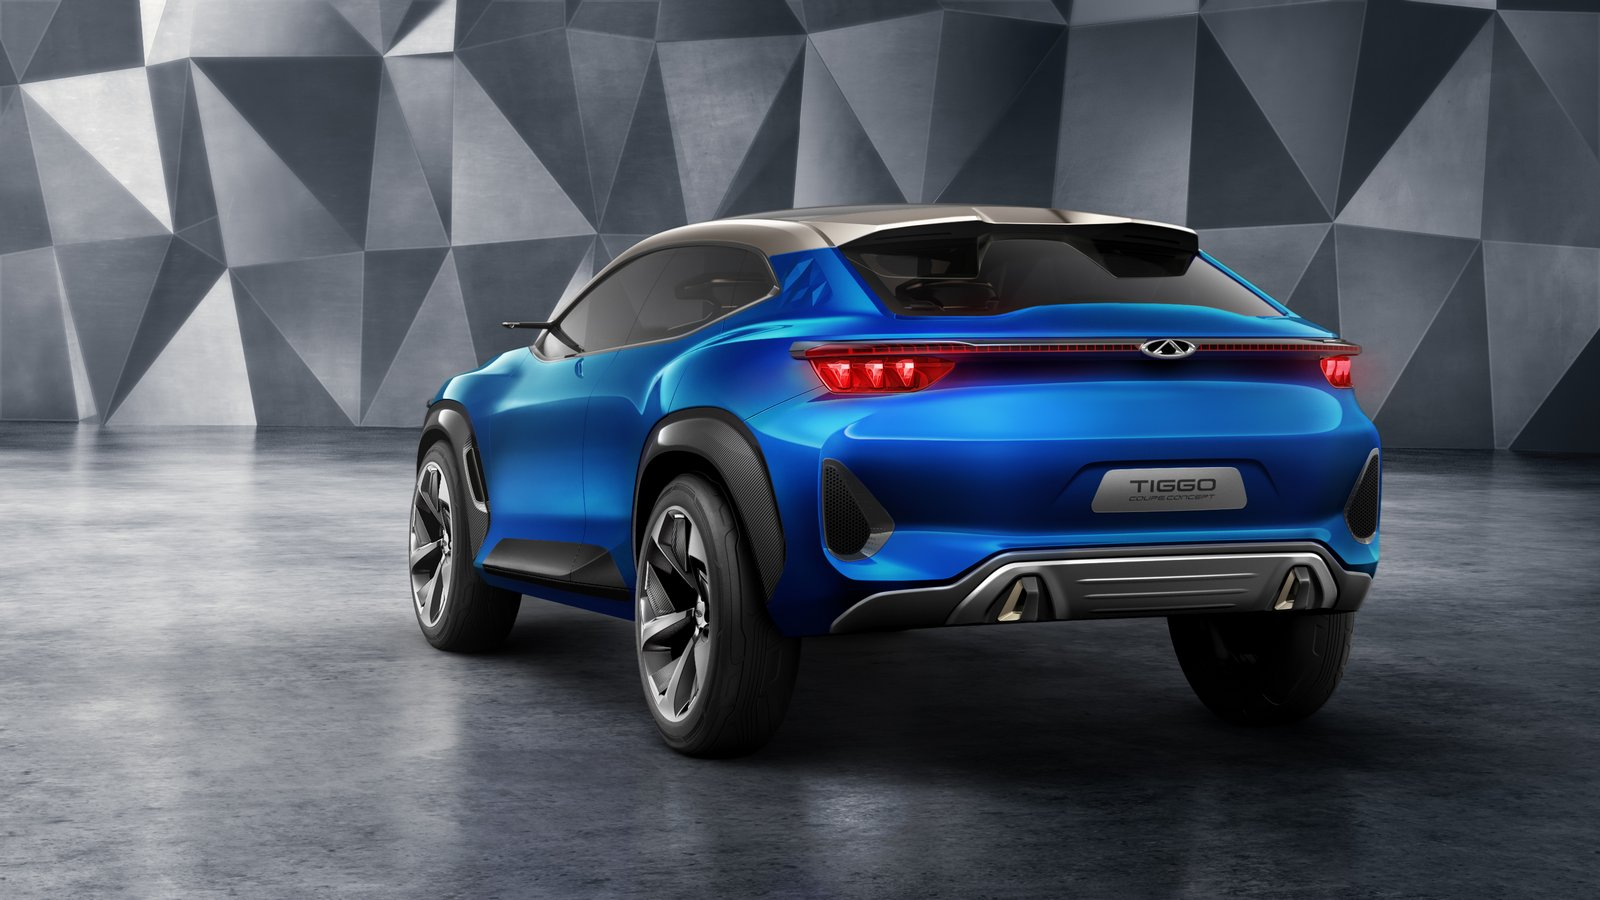 Chery Tiggo Sport Coupe Concept S Steering Doubles As Video Game Controller In Autonomous Mode